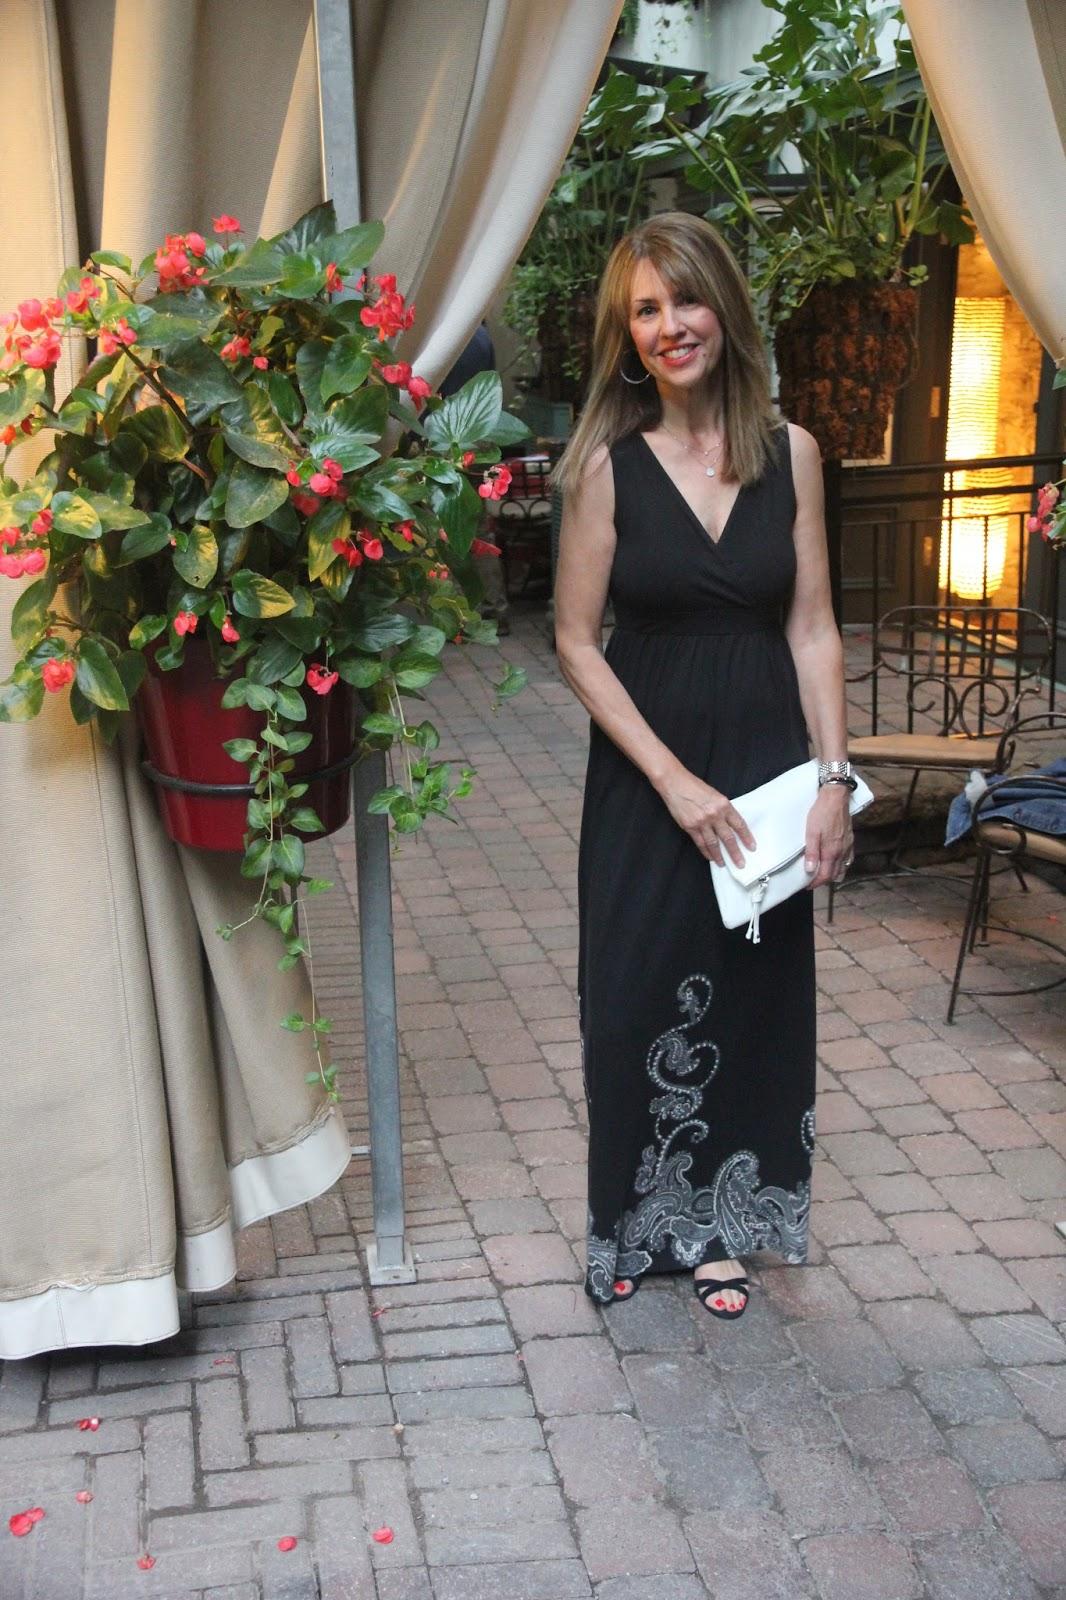 e712d55257e Aventura dress - The Midlife Fashionista